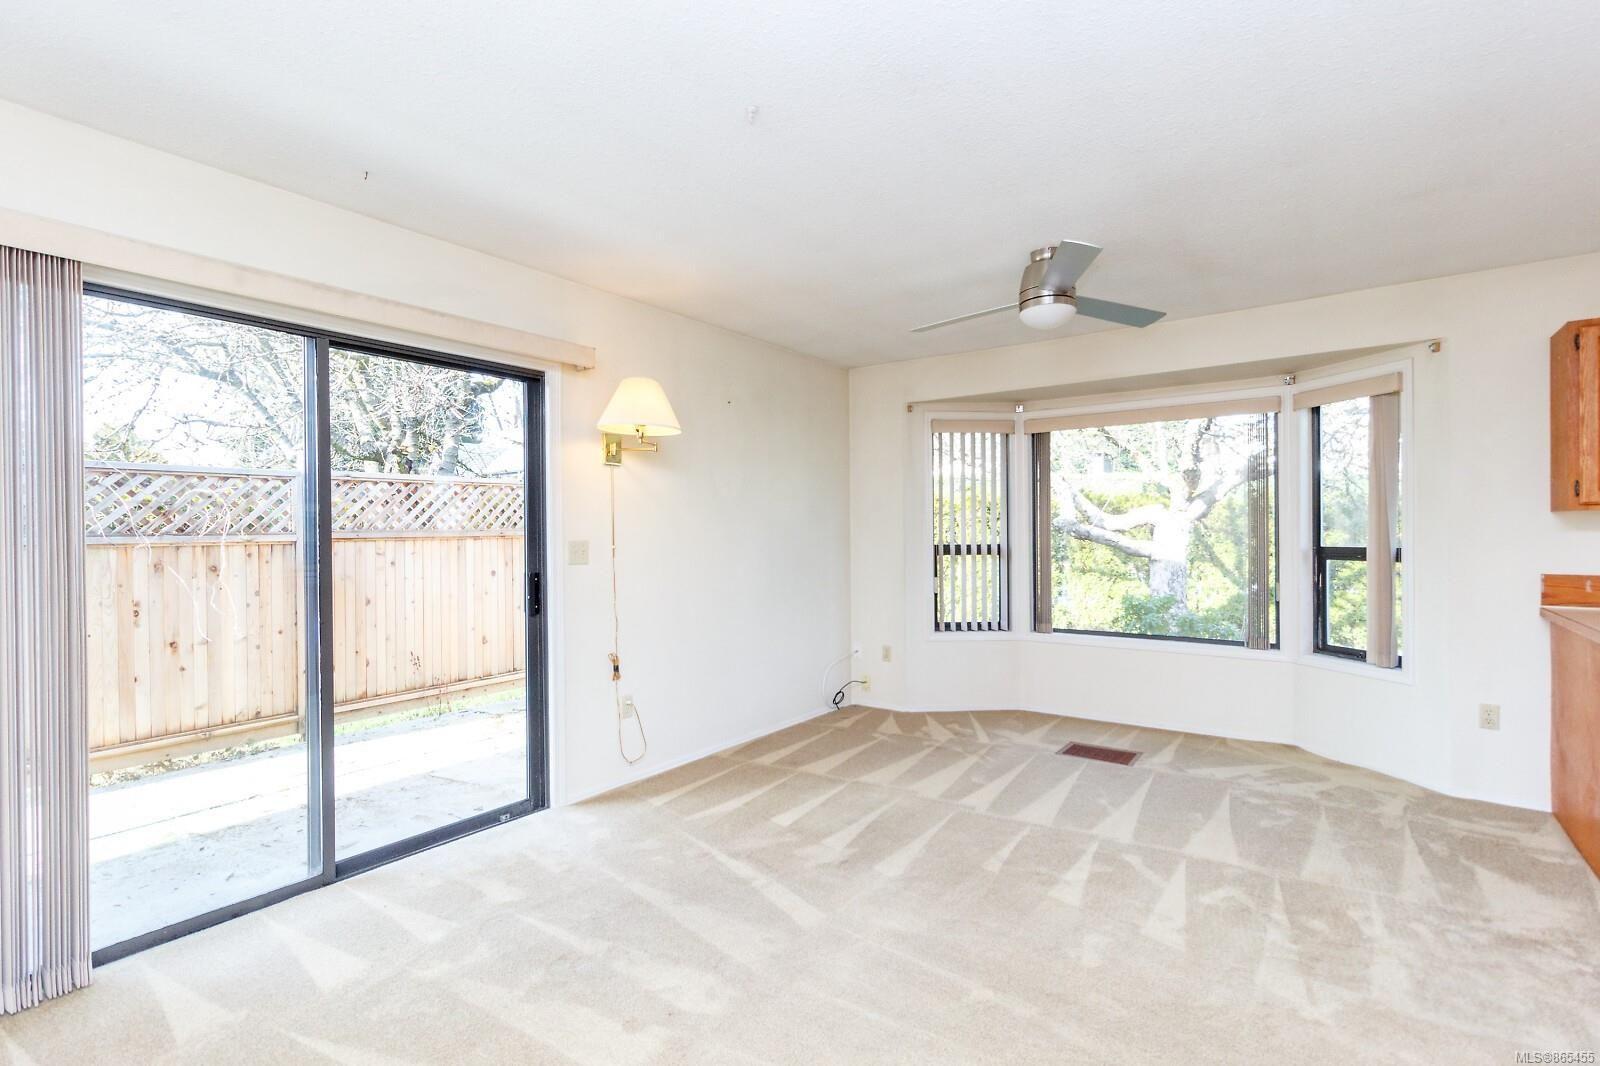 Photo 10: Photos: 399 Beech Ave in : Du East Duncan House for sale (Duncan)  : MLS®# 865455